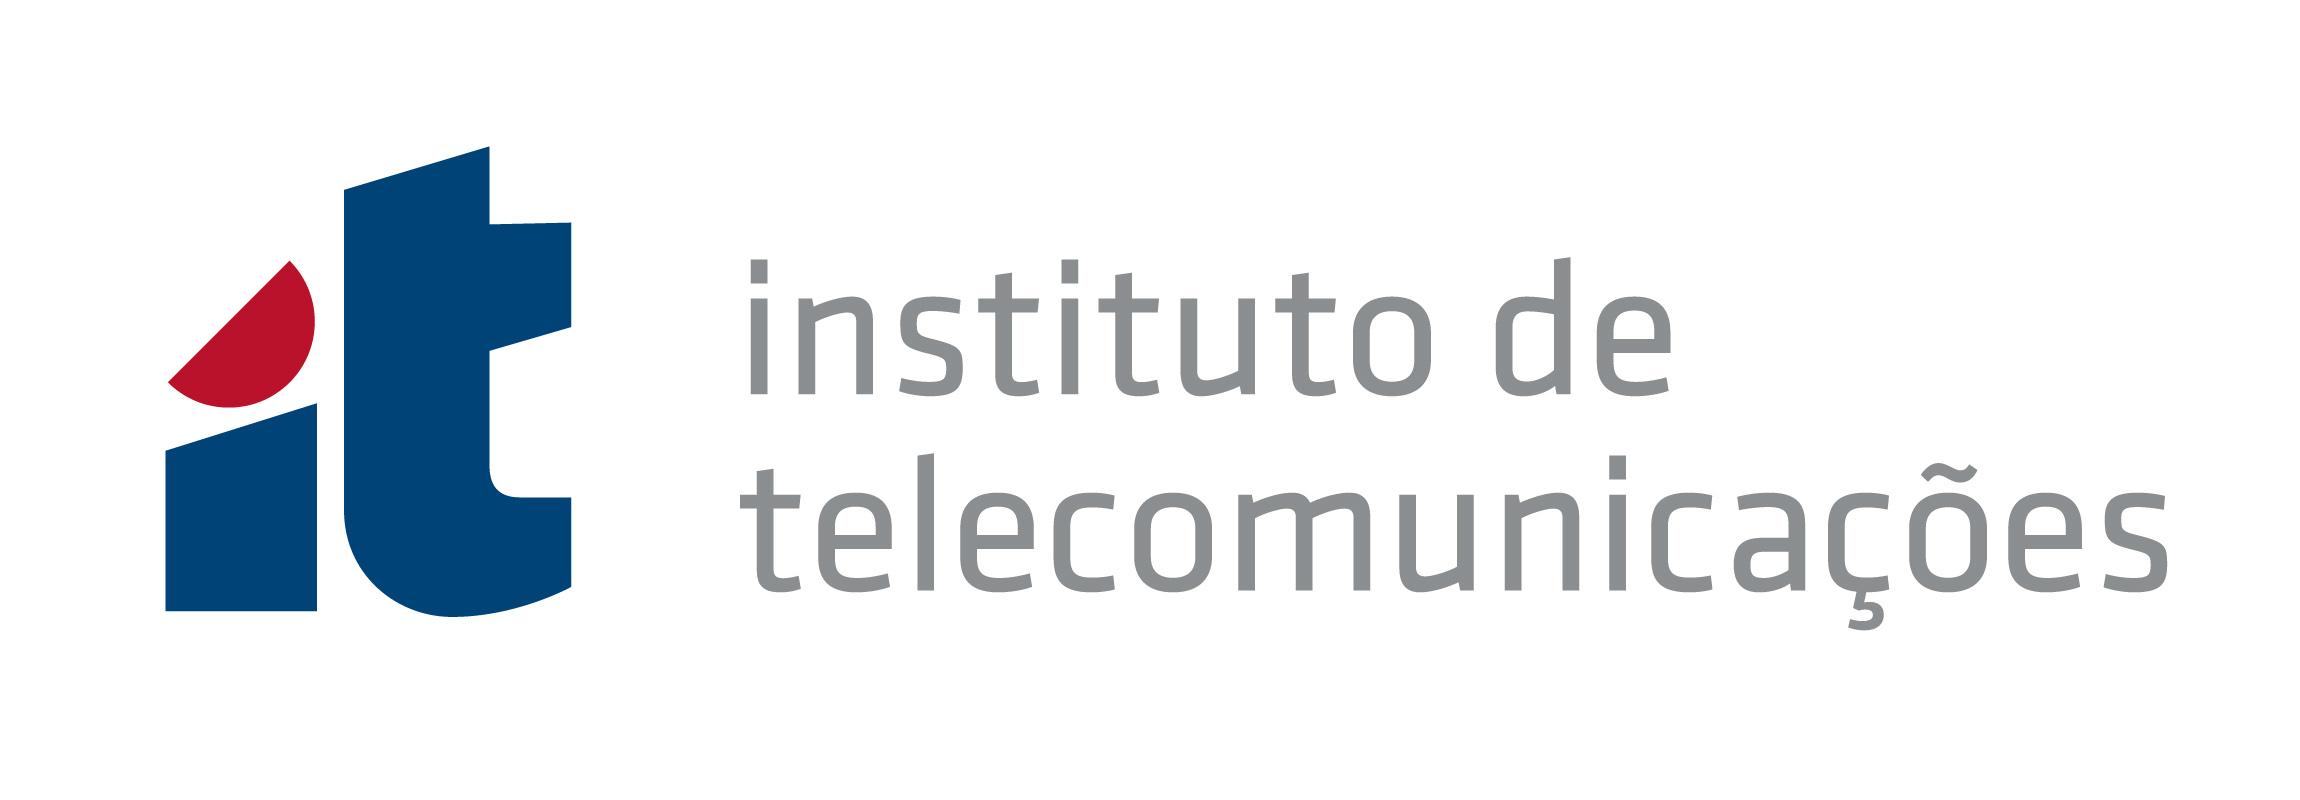 logotipo_IT_h_2300px.jpg